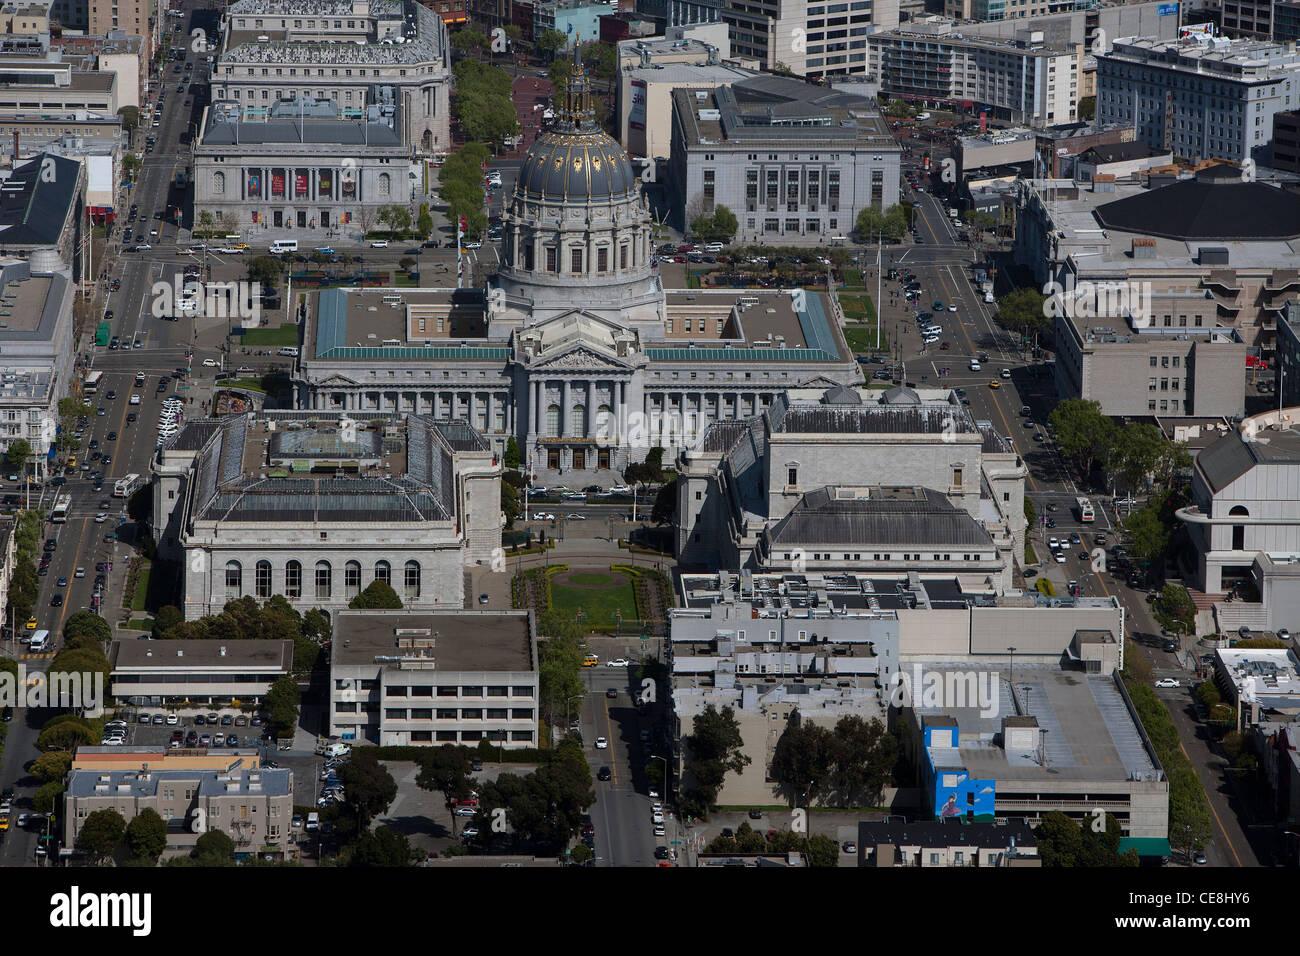 aerial photograph City Hall Civic Center San Francisco, California - Stock Image